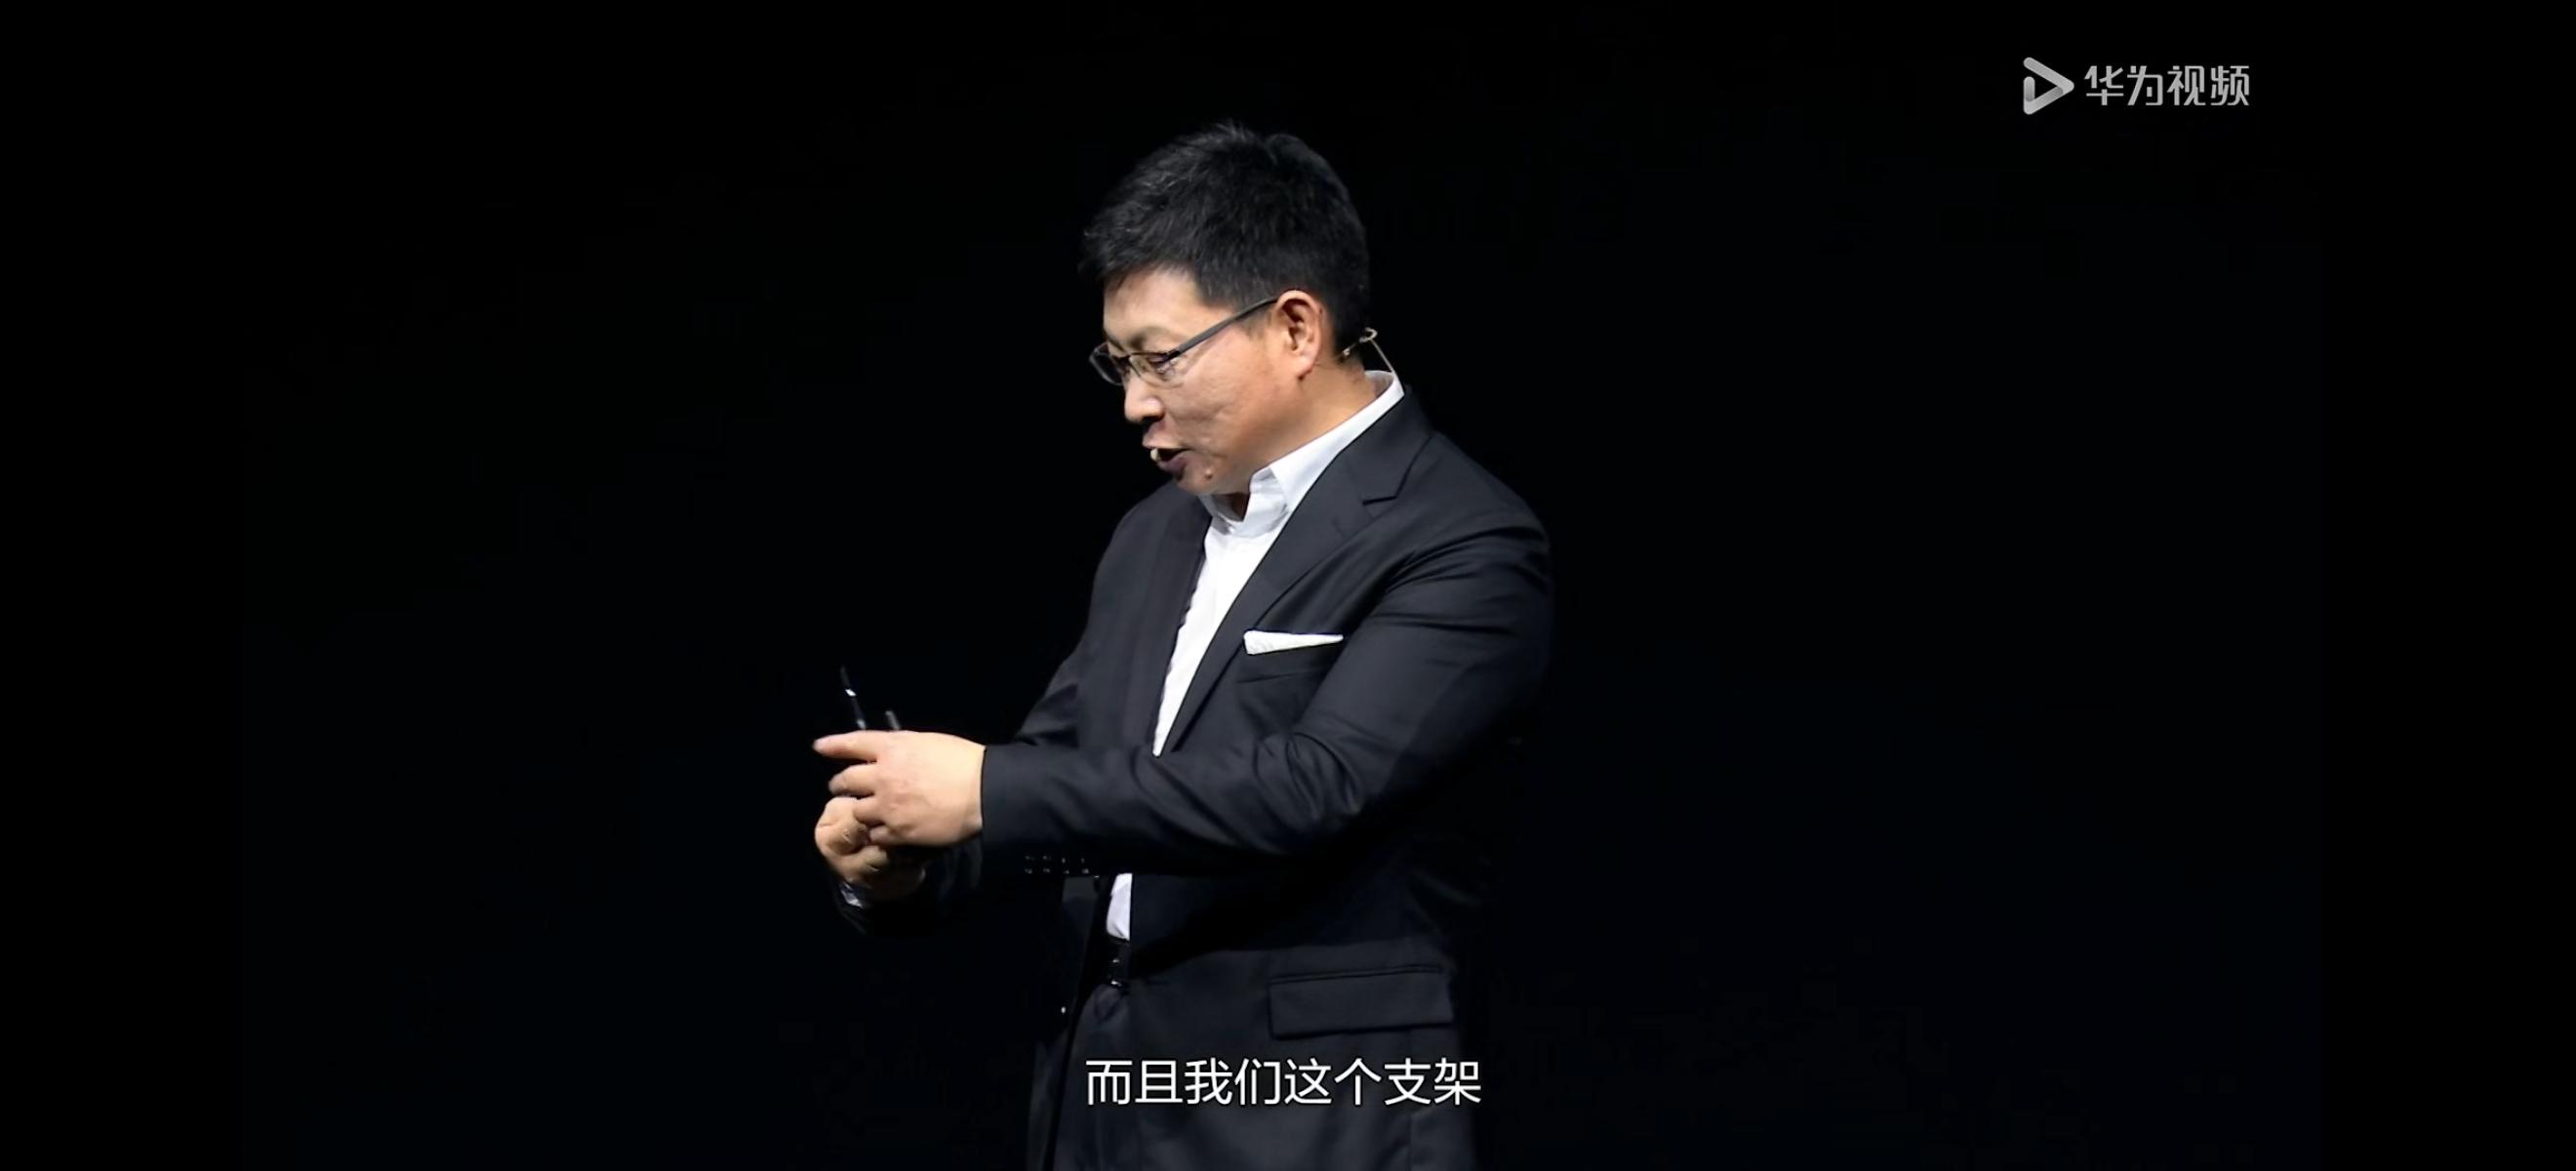 Screenshot_20210222_202518_com.huawei.himovie.jpg